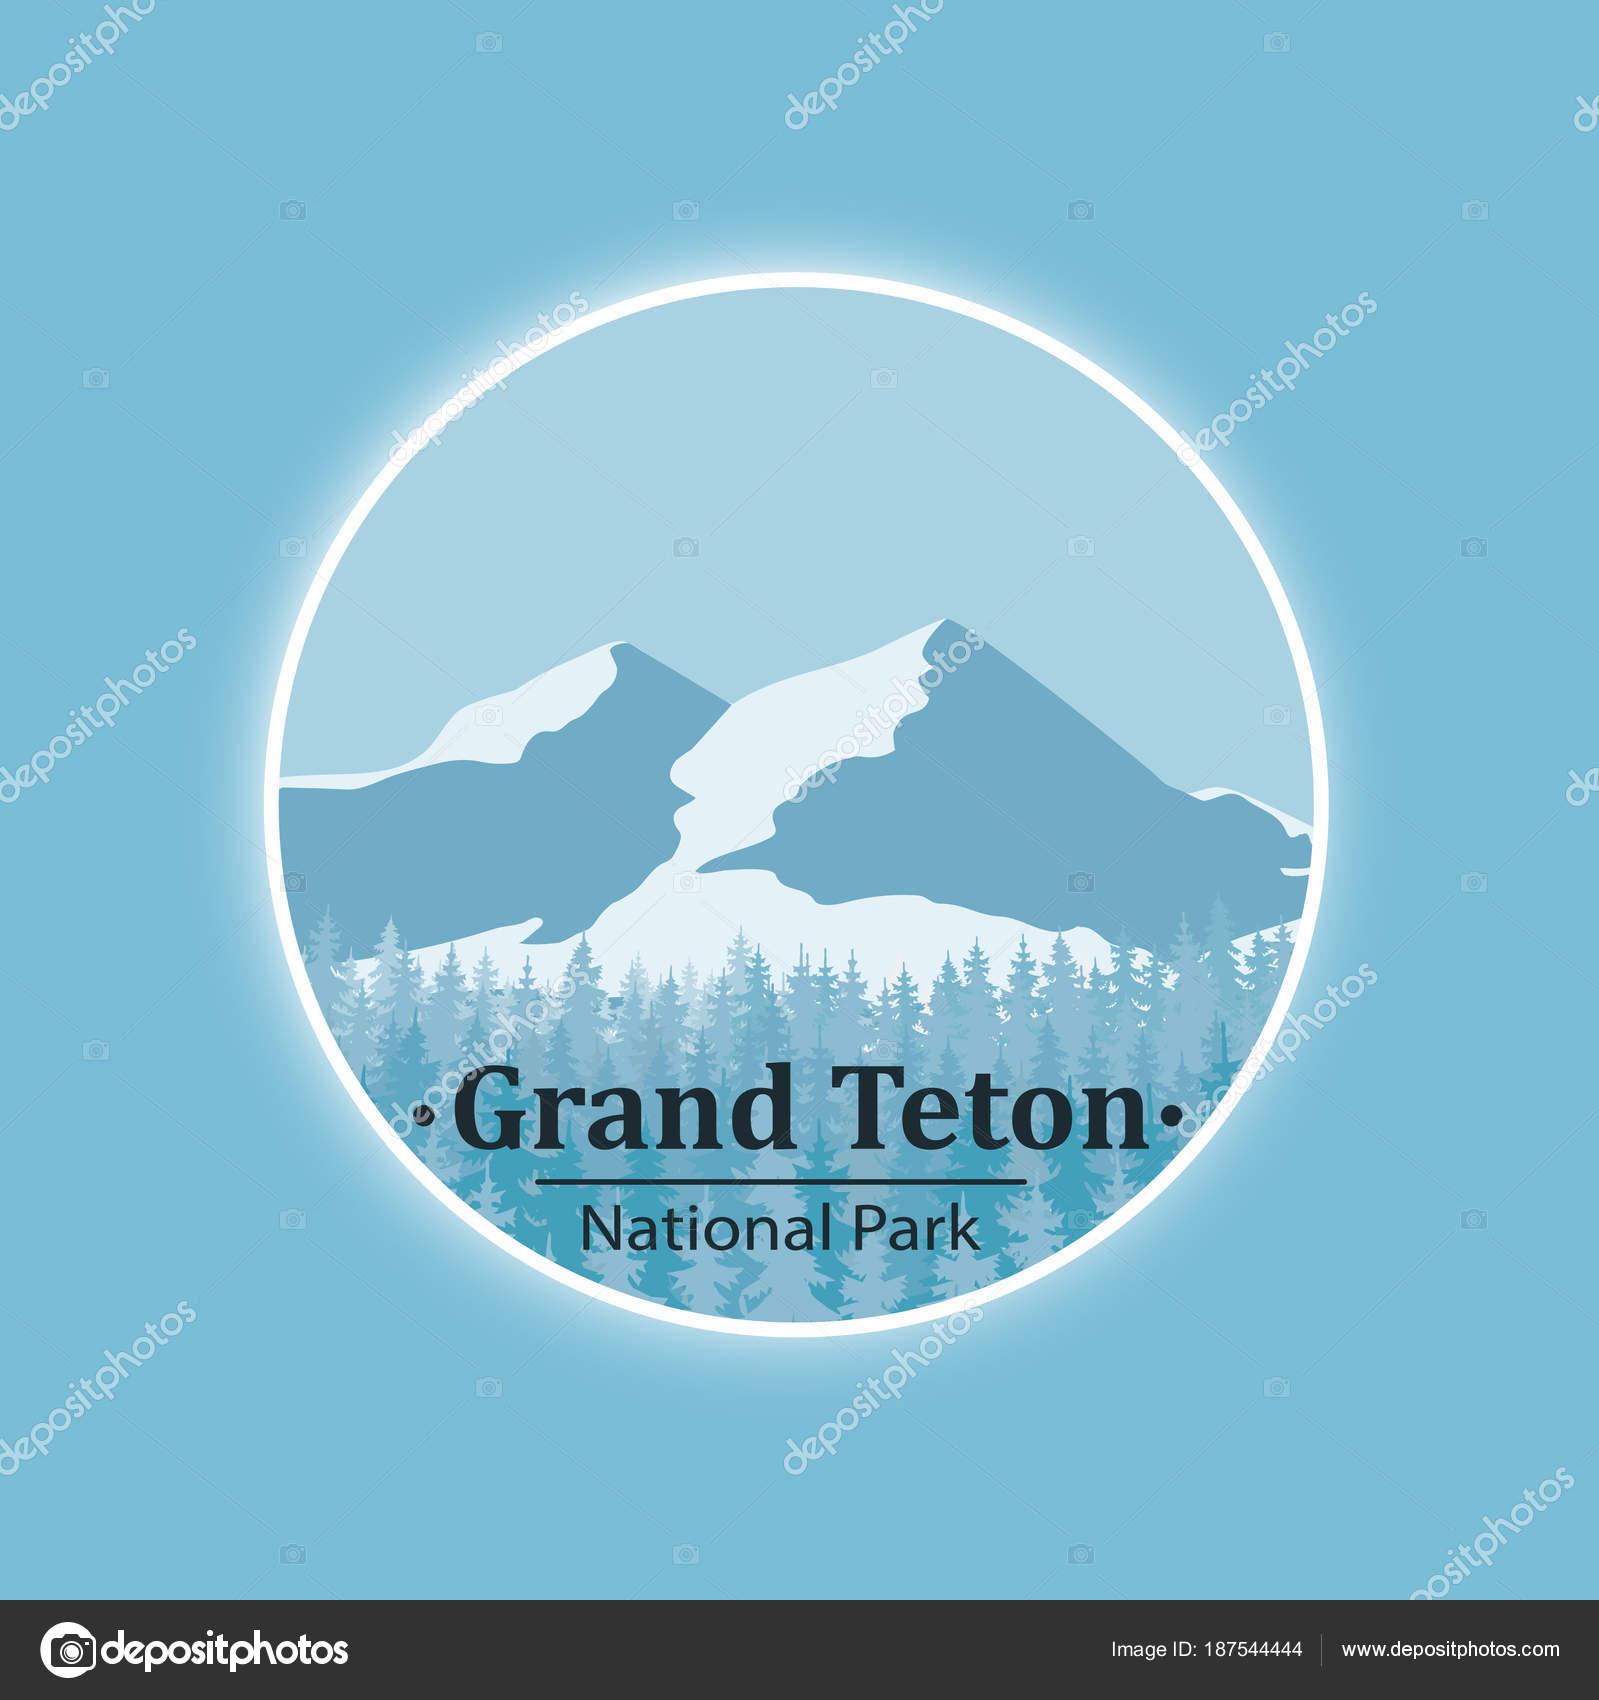 National Park Symbol Ctor Icon Stock Vector Matc 187544444